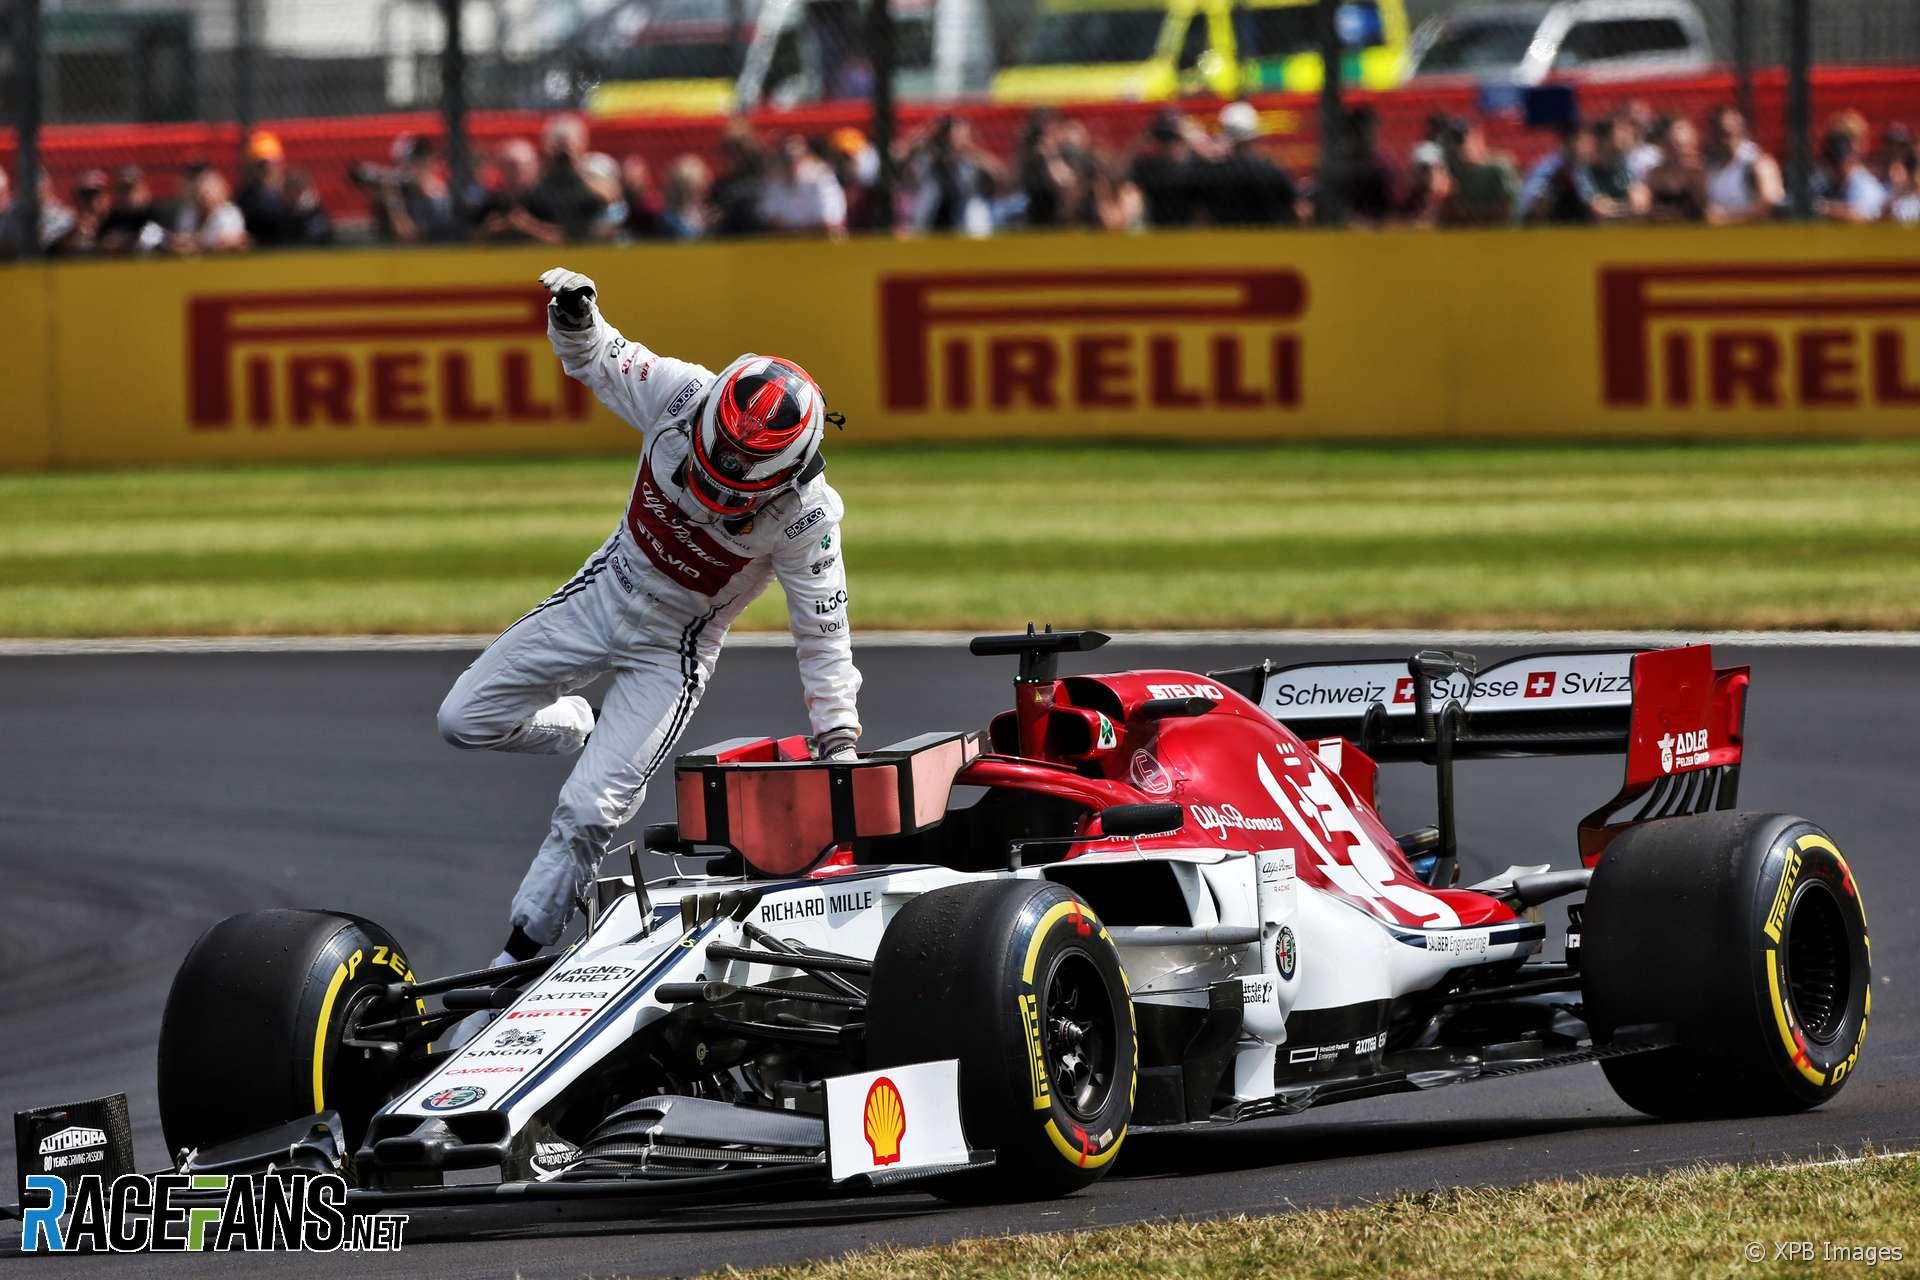 Kimi Raikkonen, Alfa Romeo, Silverstone, 2019